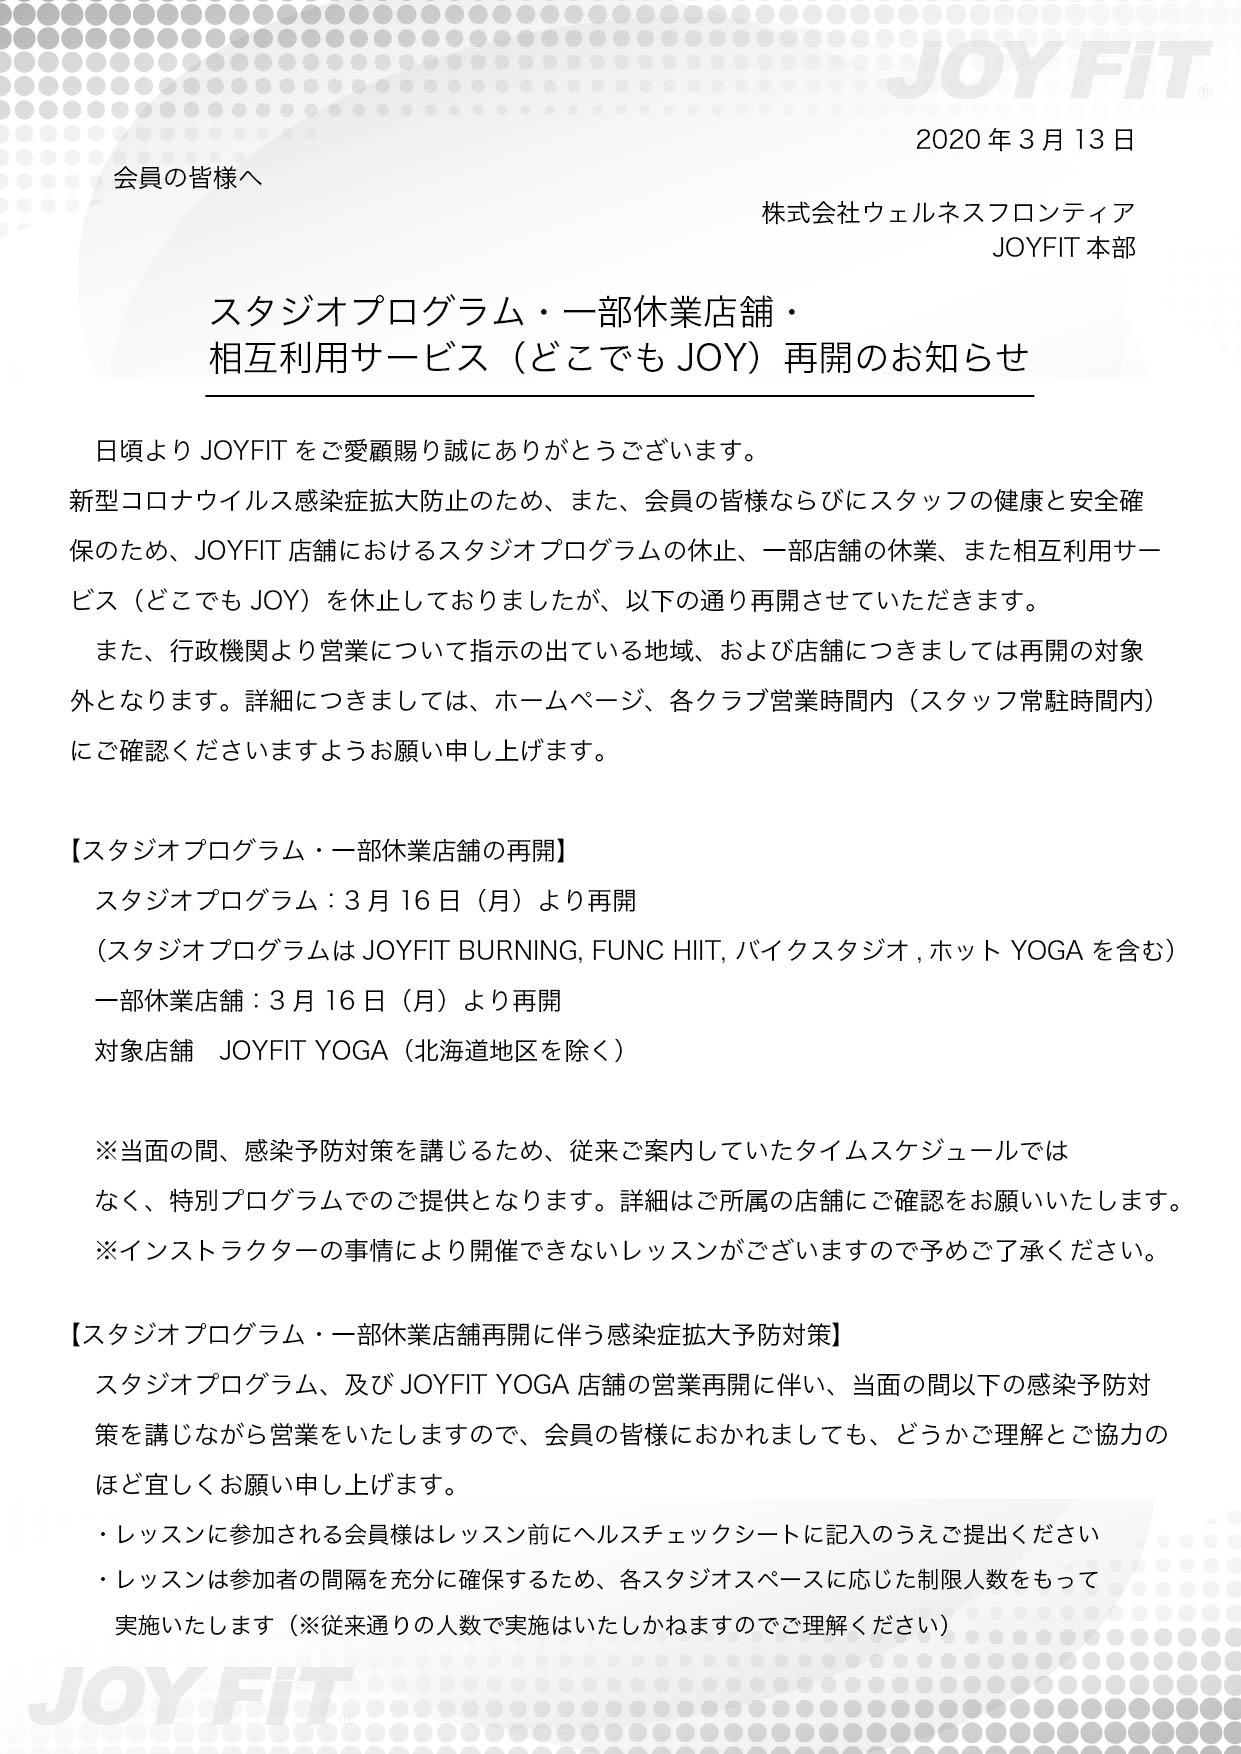 +⑬【JOYFIT】スタジオ・休業店舗・相互利用サービス再開のお知らせ(HP・館内POP・アプリ用)20200313_アートボード 1